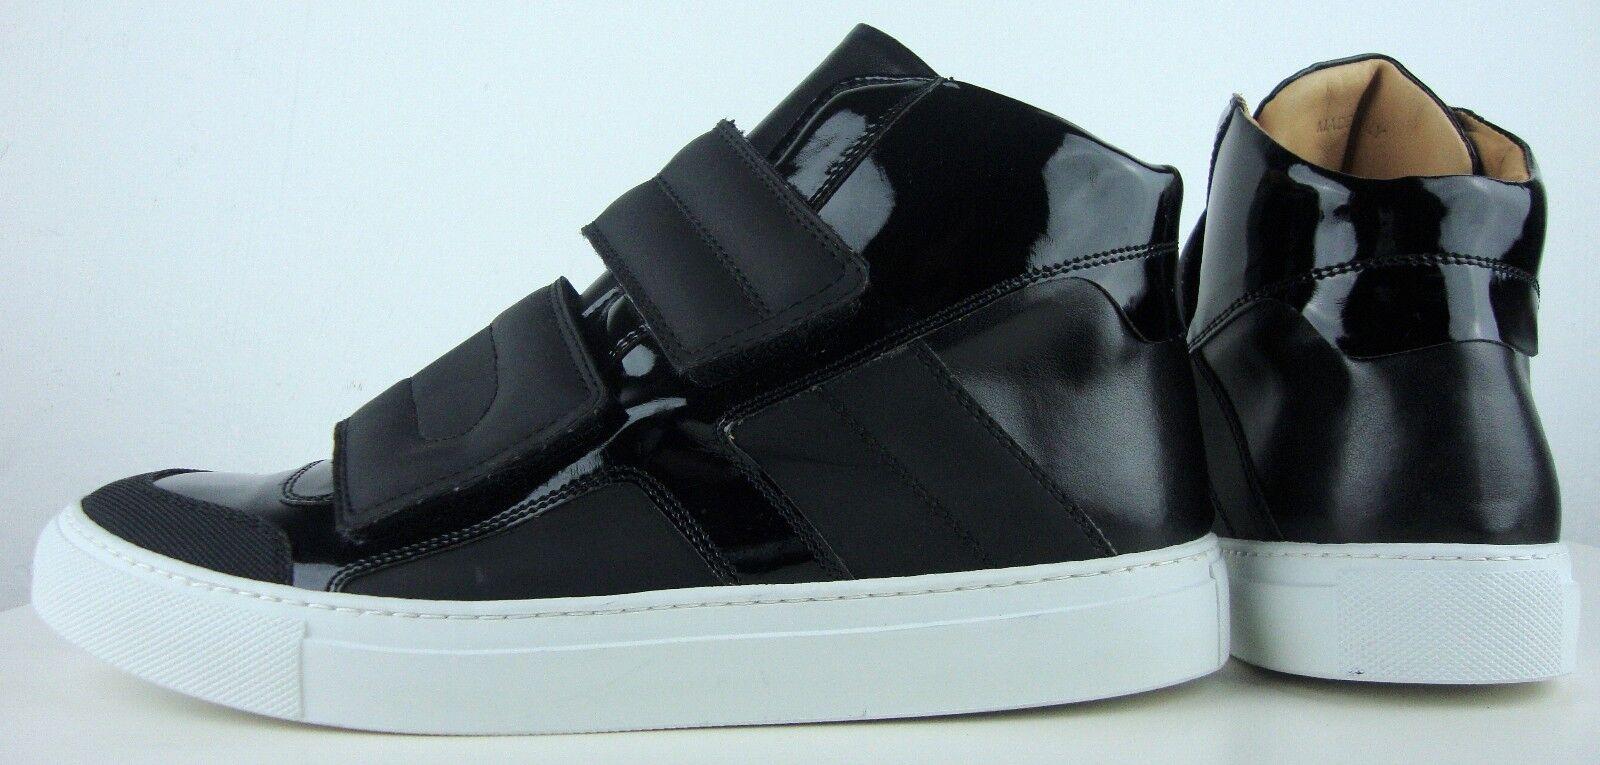 Maison Martin Margiela top High sneakers señora de diseño zapatos Black nuevo